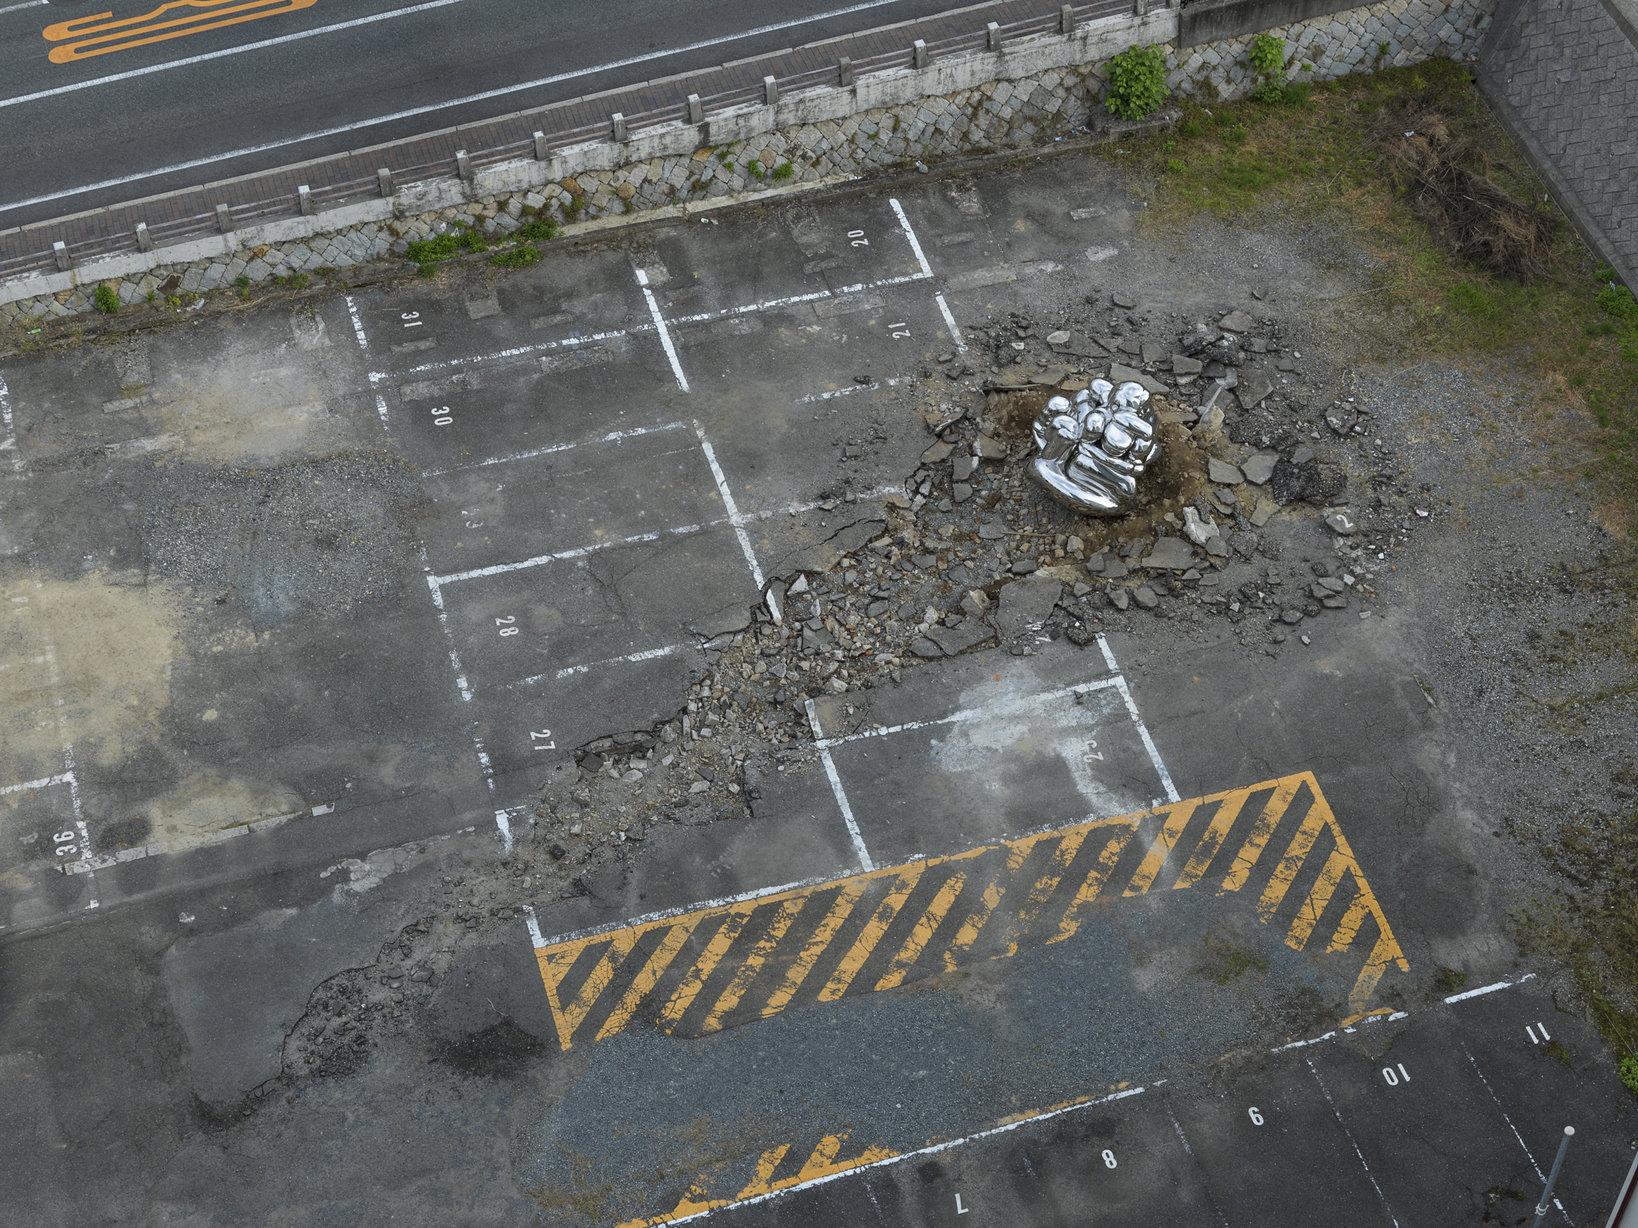 Ryan Gander Because Editorial is Costly 2016 Stainless steel, rubble Collection of Ishikawa Foundation Courtesy of the artist and TARO NASU, Tokyo © Okayama Art Summit 2016  Photo: Yasushi Ichikawa